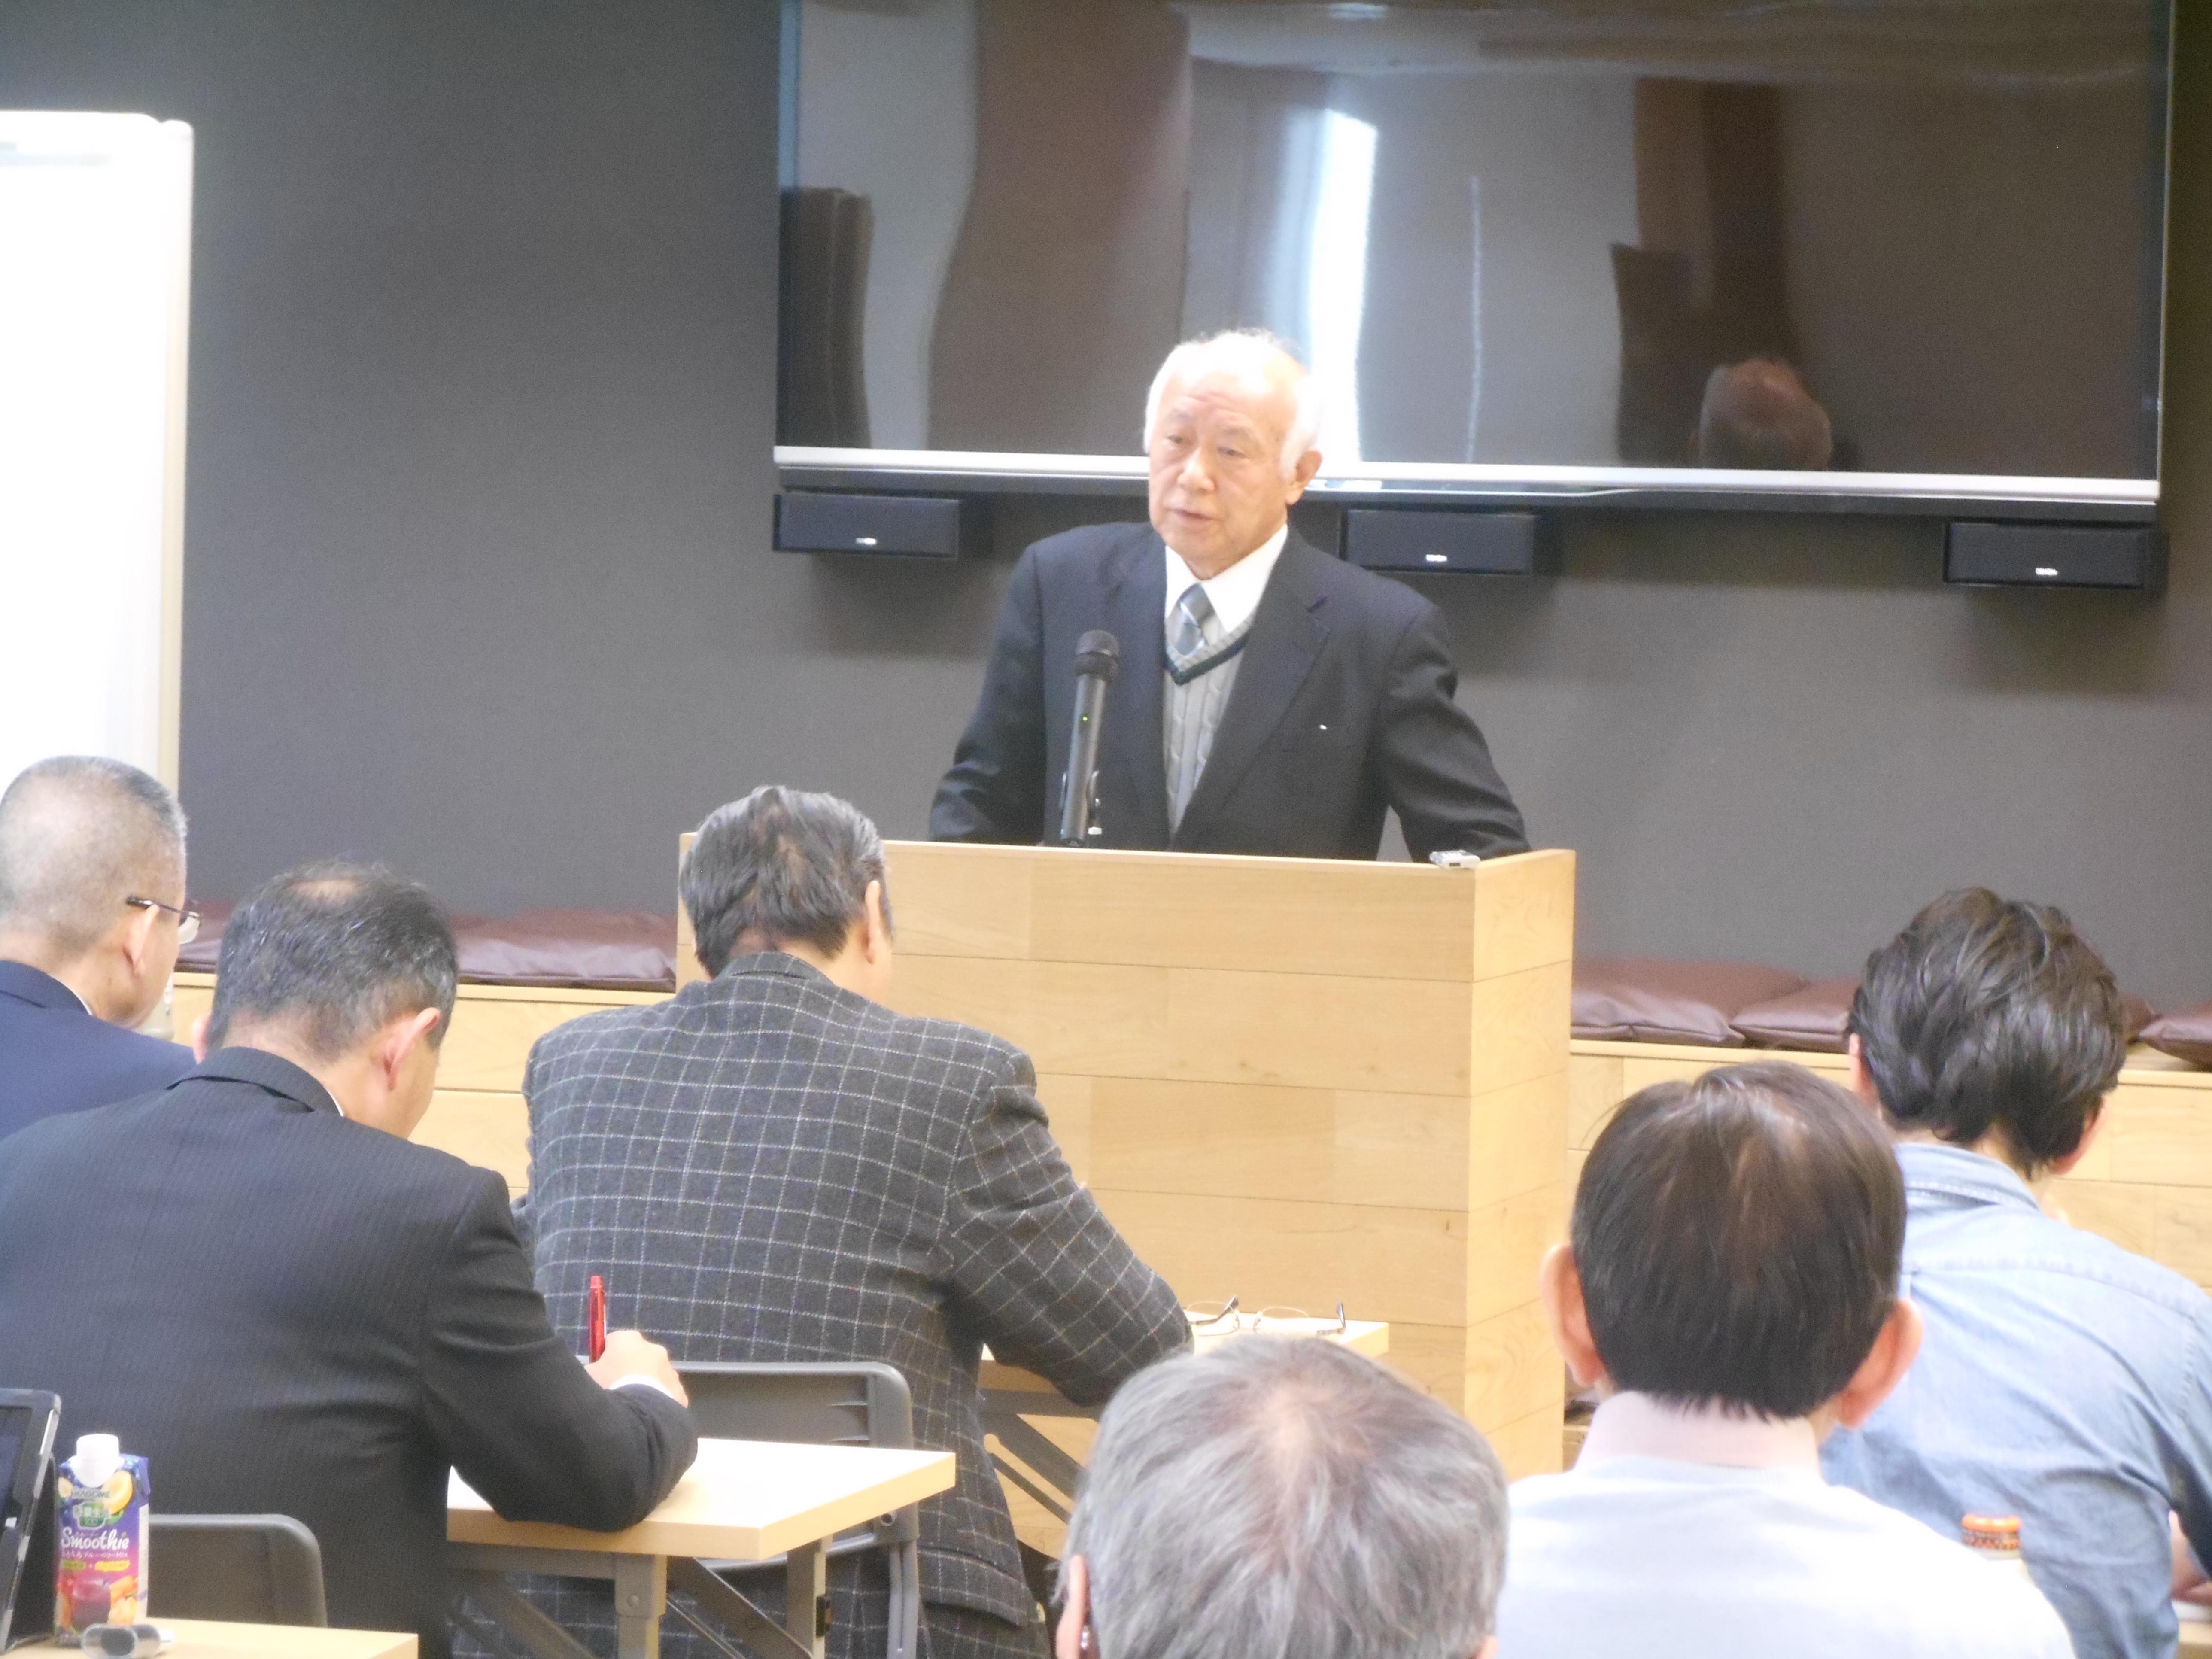 DSCN0042 - 4月1日東京思風塾の開催になります。